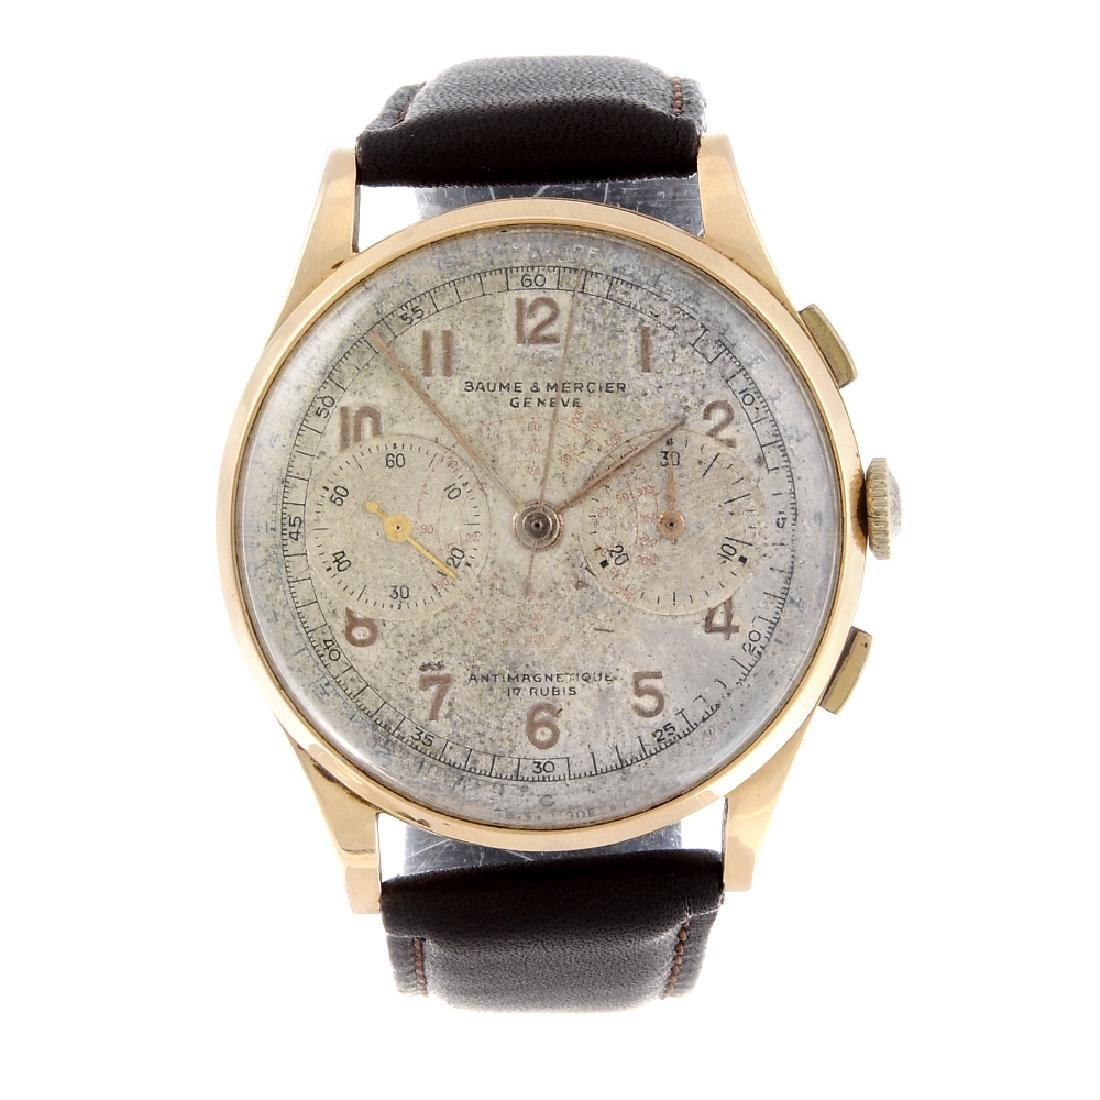 BAUME & MERCIER - a gentleman's chronograph wrist